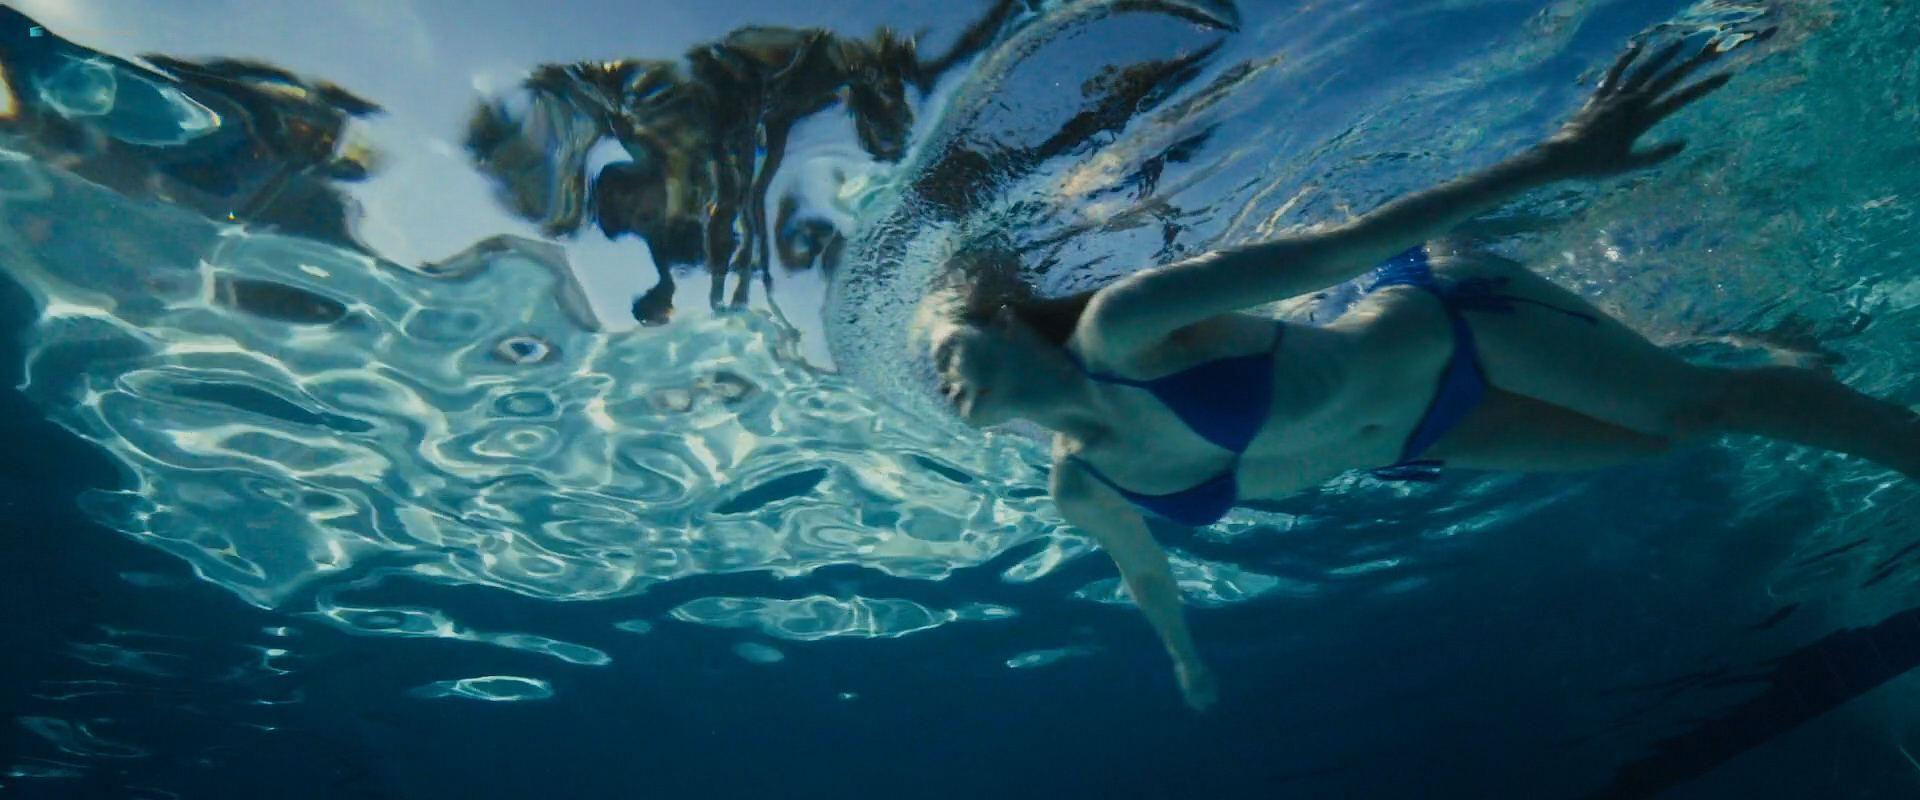 0919192123566_07_Elle-Fanning-hot-sexy-and-wet-in-bikini-Galveston-2018-HD-1080p-005.jpg